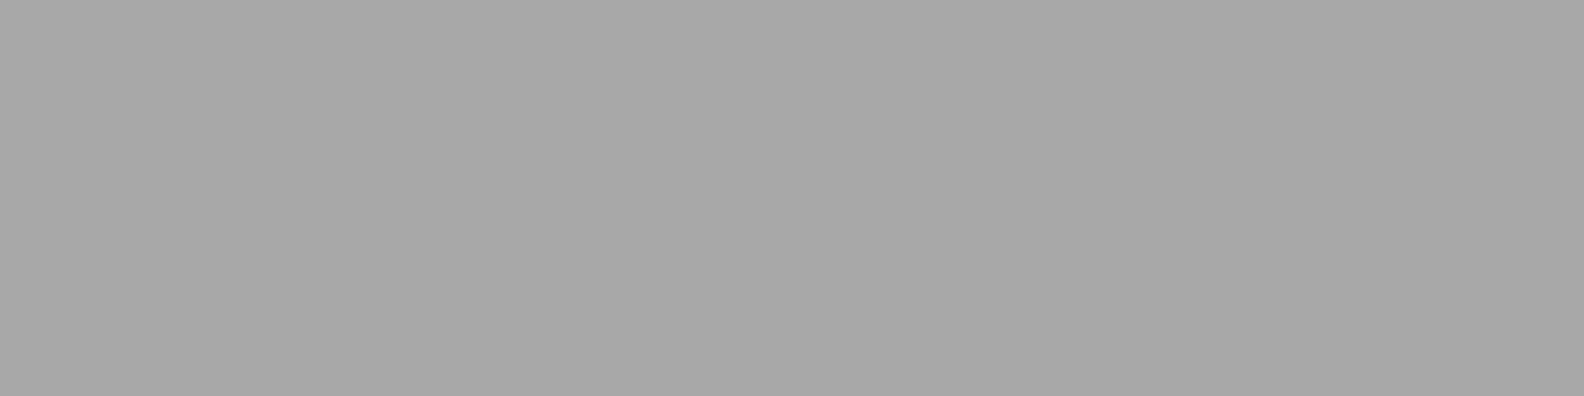 1584x396 Dark Gray Solid Color Background